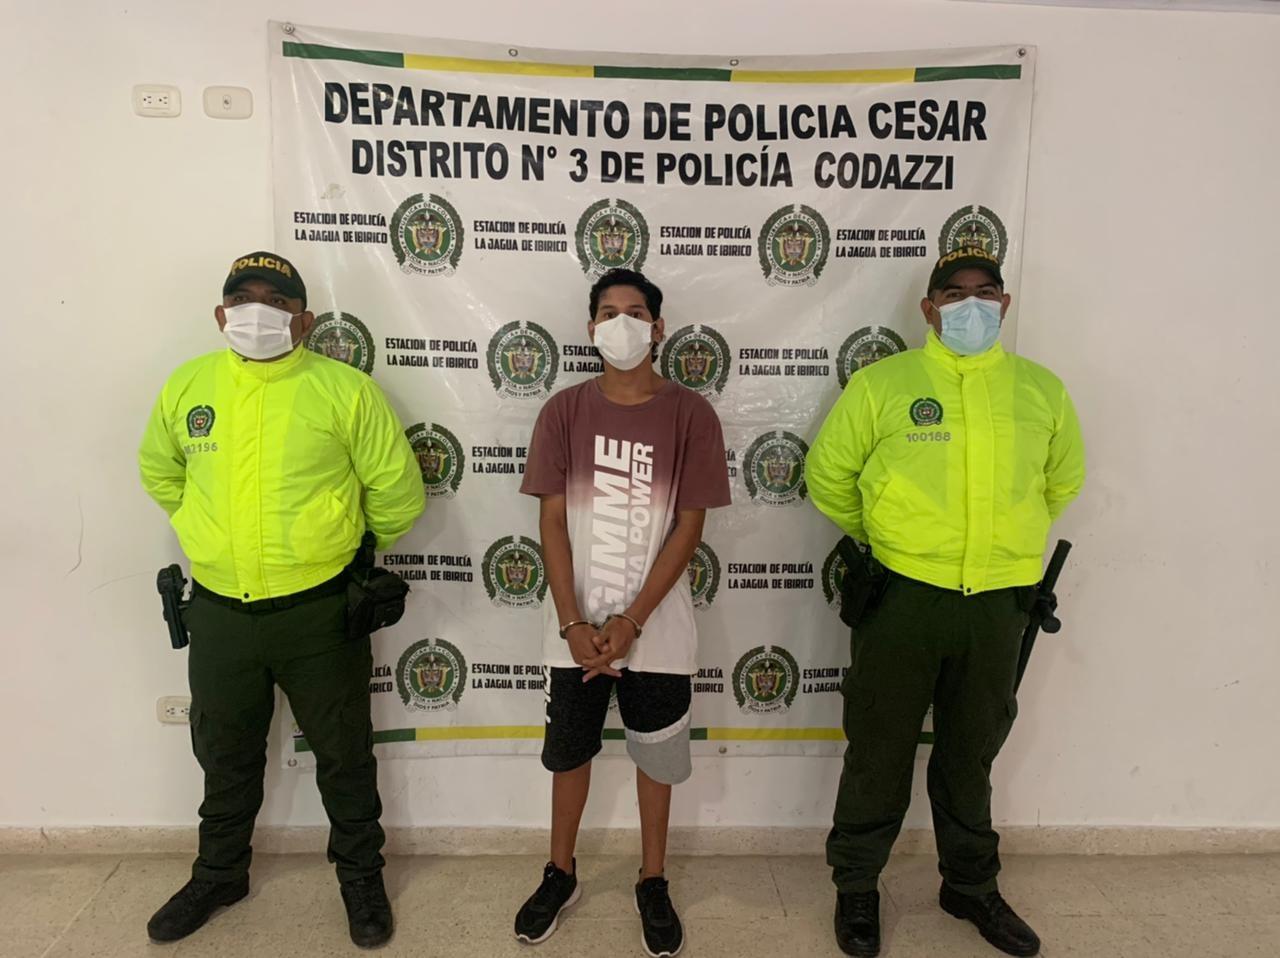 hoyennoticia.com, A la cárcel 'El Cole' de Becerril, por tentativa de homicidio